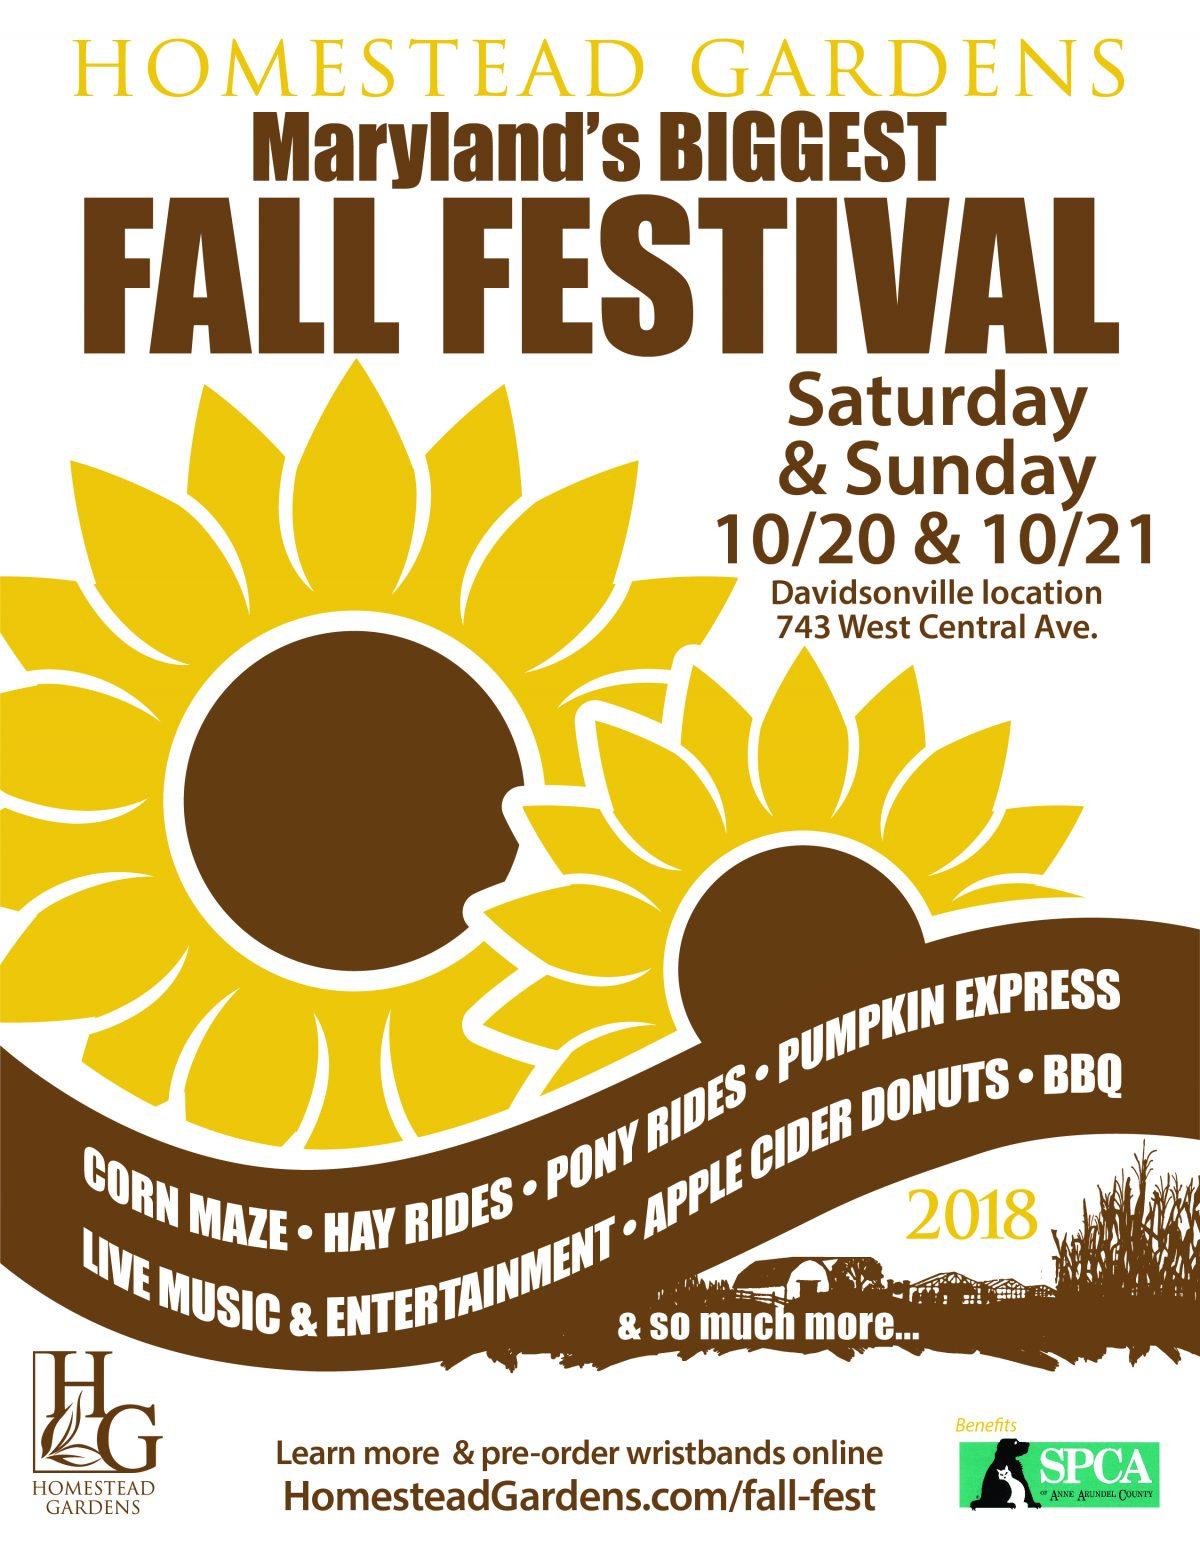 Fall Festival – 10/20 & 10/21